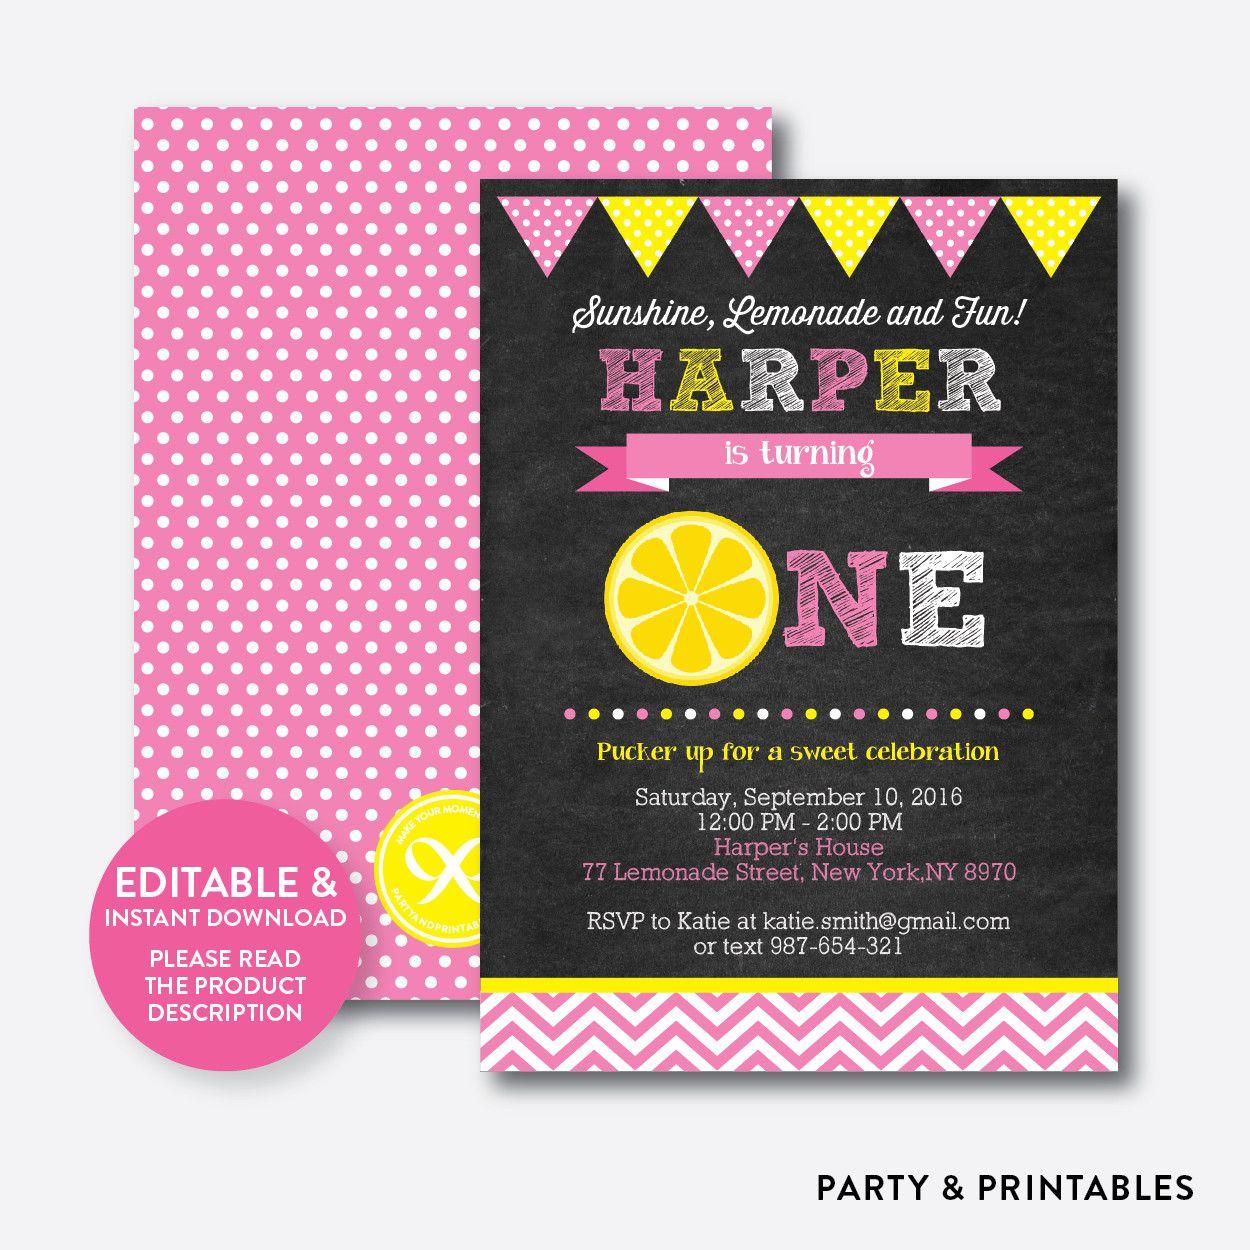 Pink Lemonade Cha... http://partyandprintables.com/products/pink-lemonade-chalkboard-kids-birthday-invitation-editable-instant-download-ckb-63?utm_campaign=social_autopilot&utm_source=pin&utm_medium=pin #partyprintables #birthdayinvitation #partysupplies #partydecor #kidsbirthday #babyshower